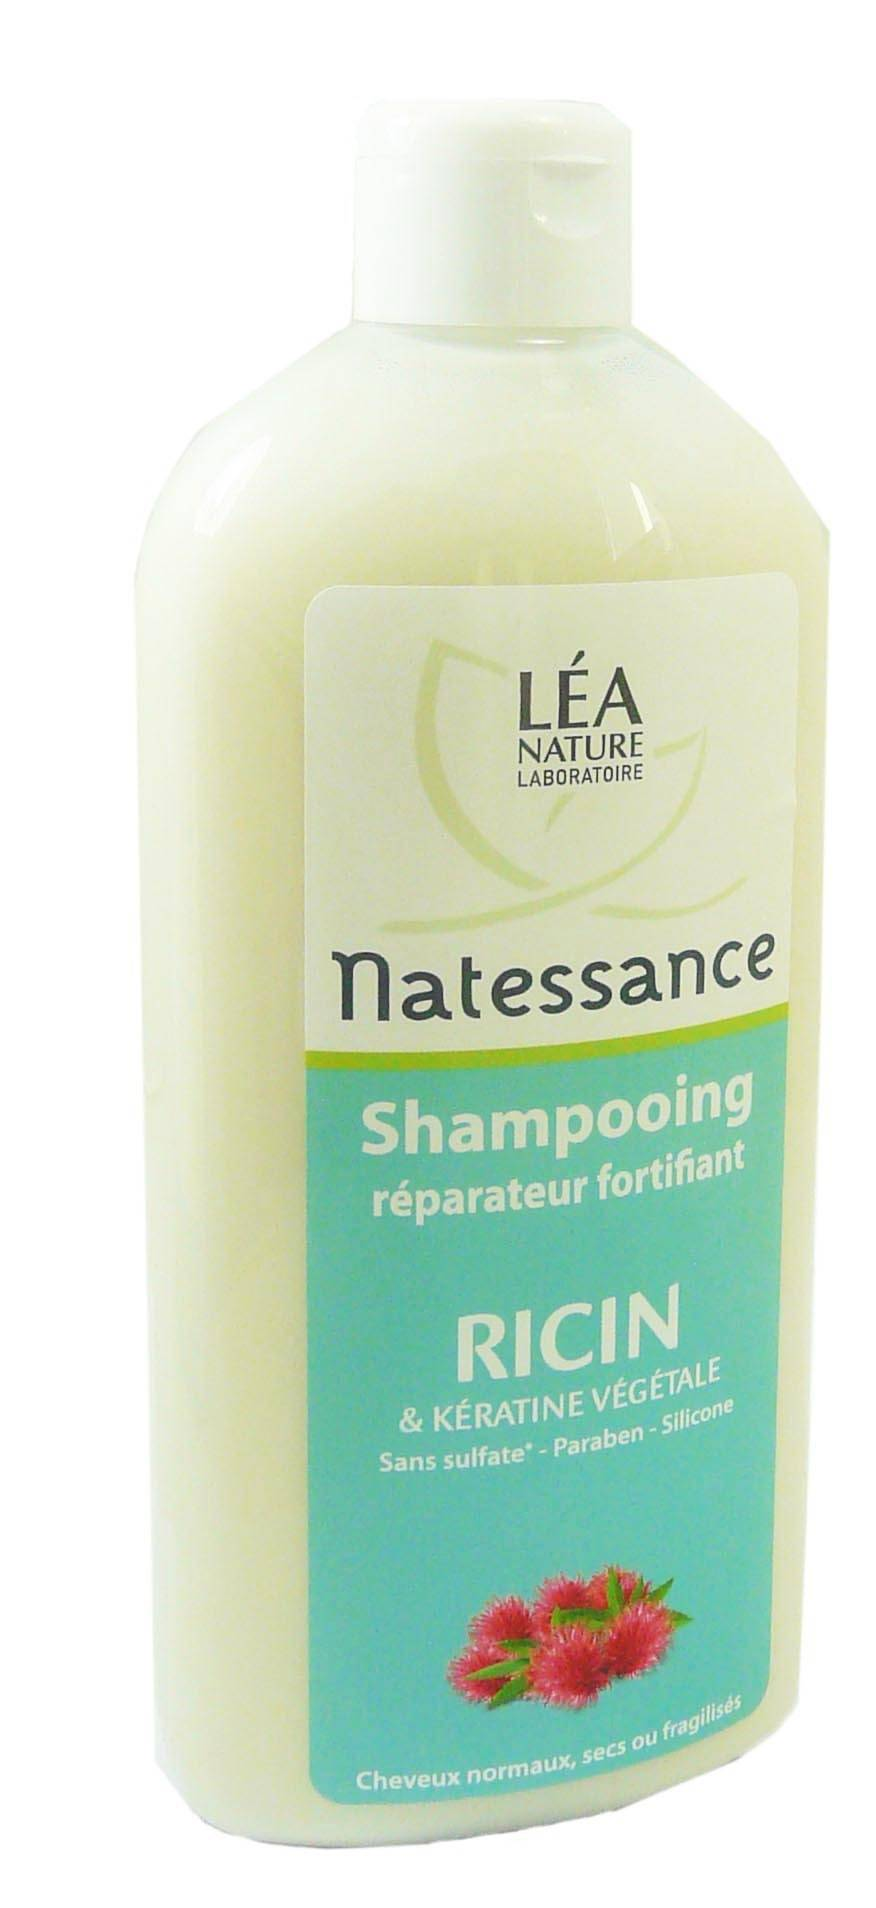 Natessance shampooing reparateur huile de ricin 500ml